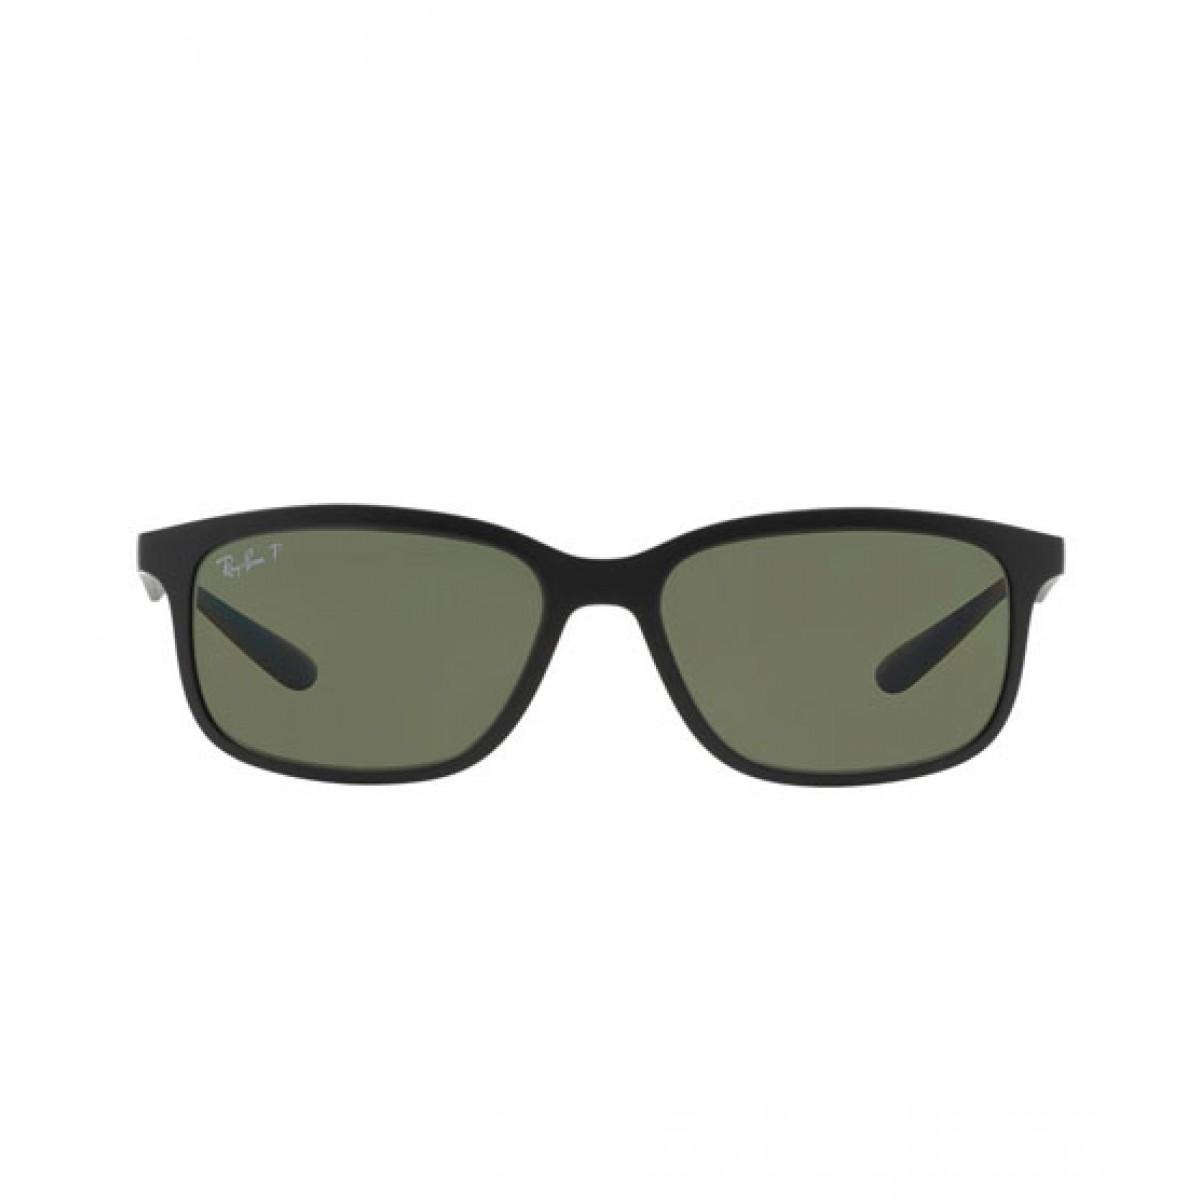 original ray ban sunglasses price in pakistan